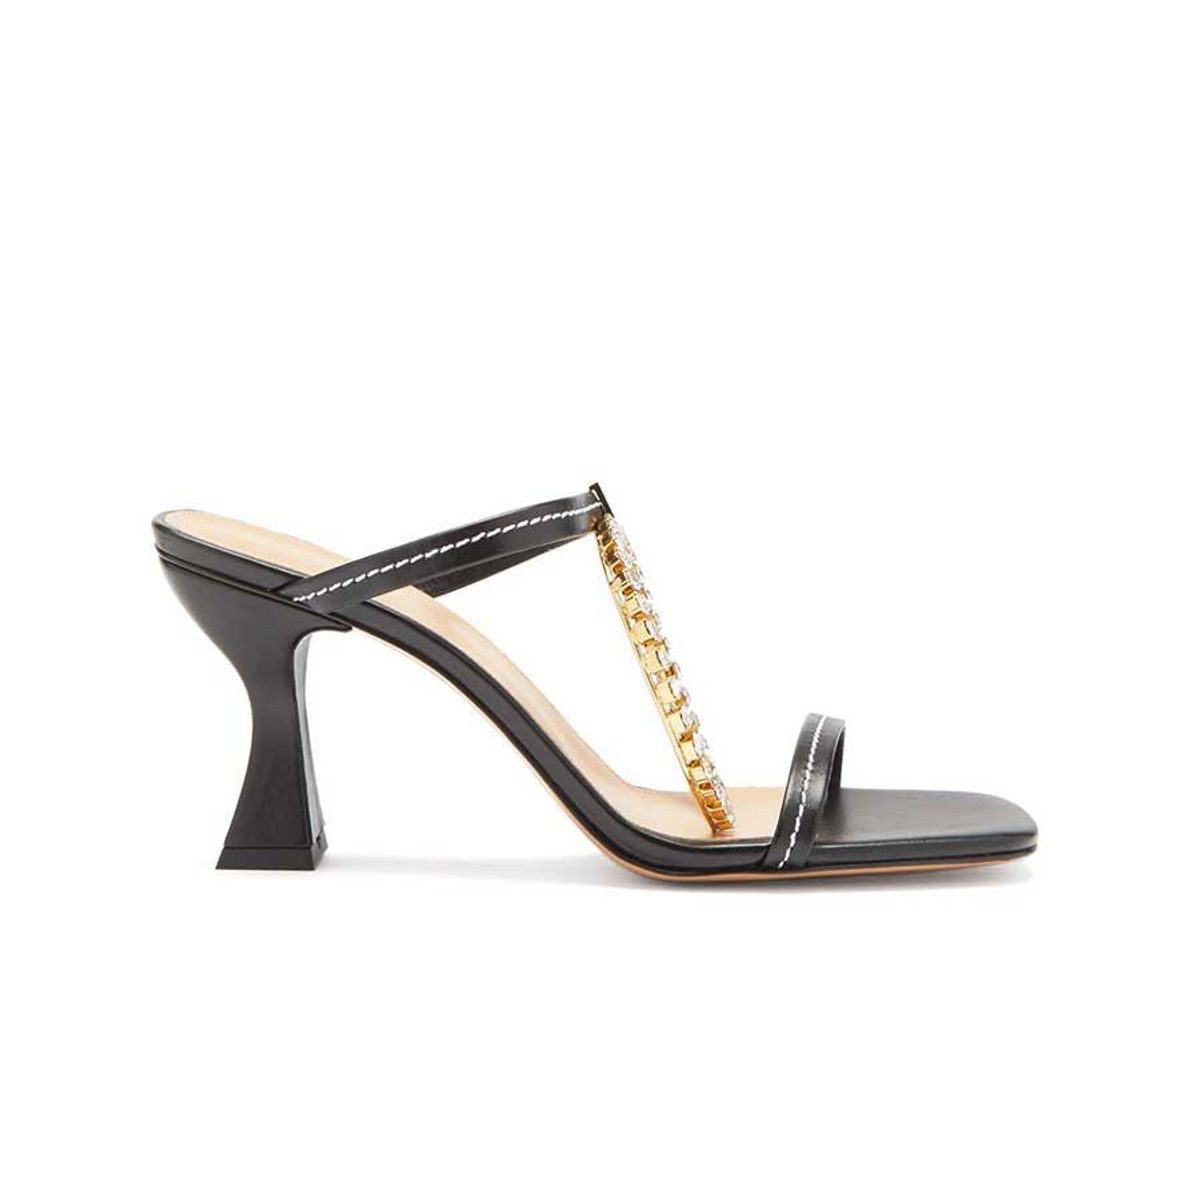 jw anderson crystal embellished square toe leather sandals